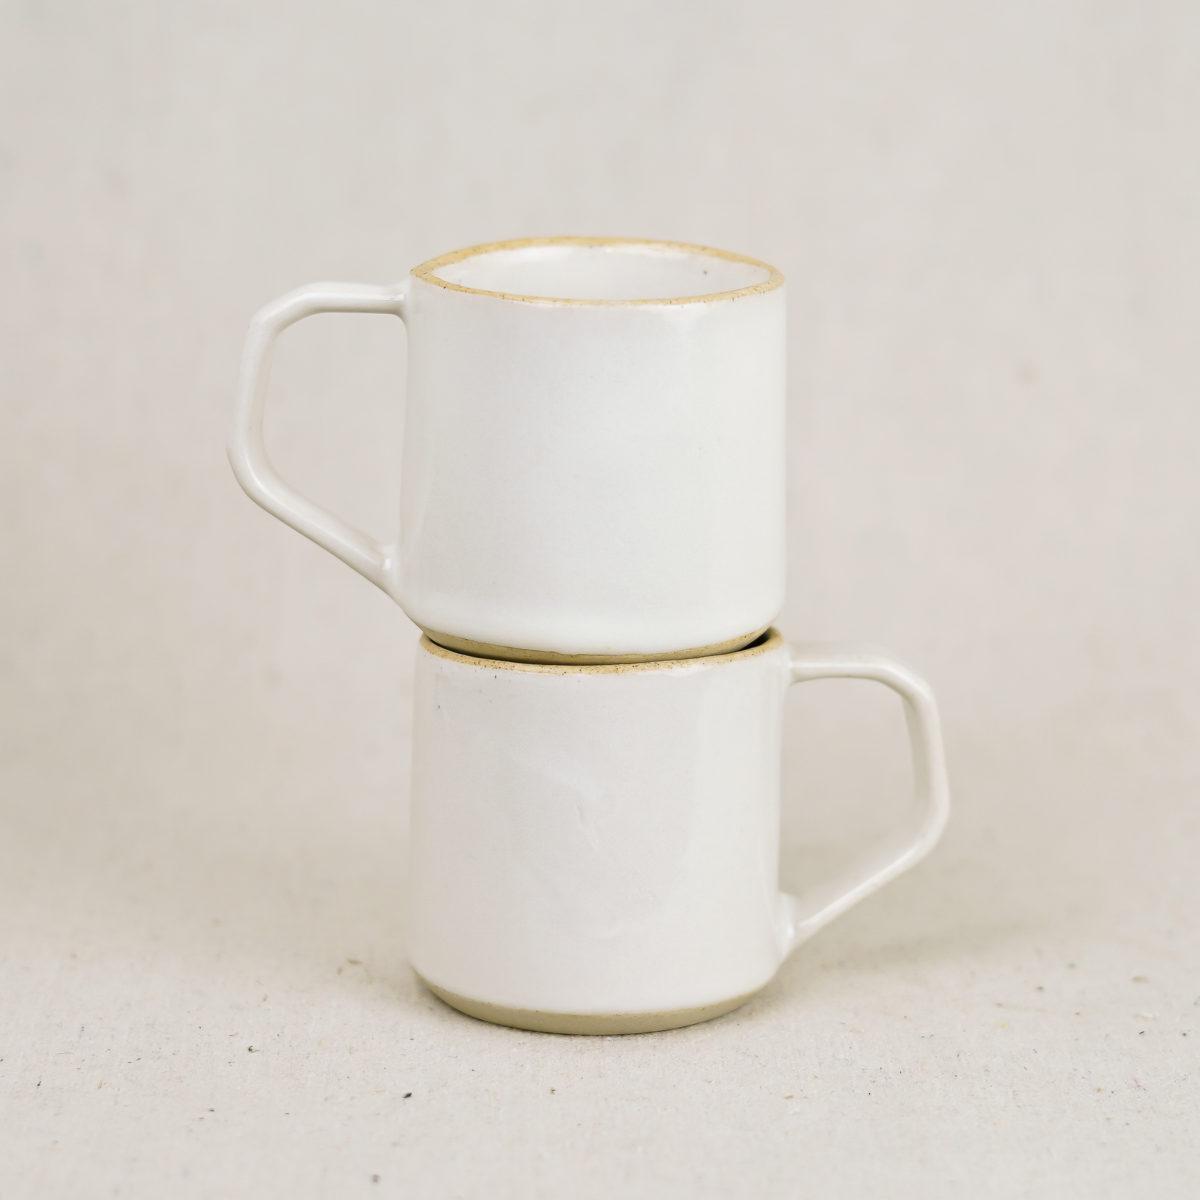 8oz-ceramic-mugs